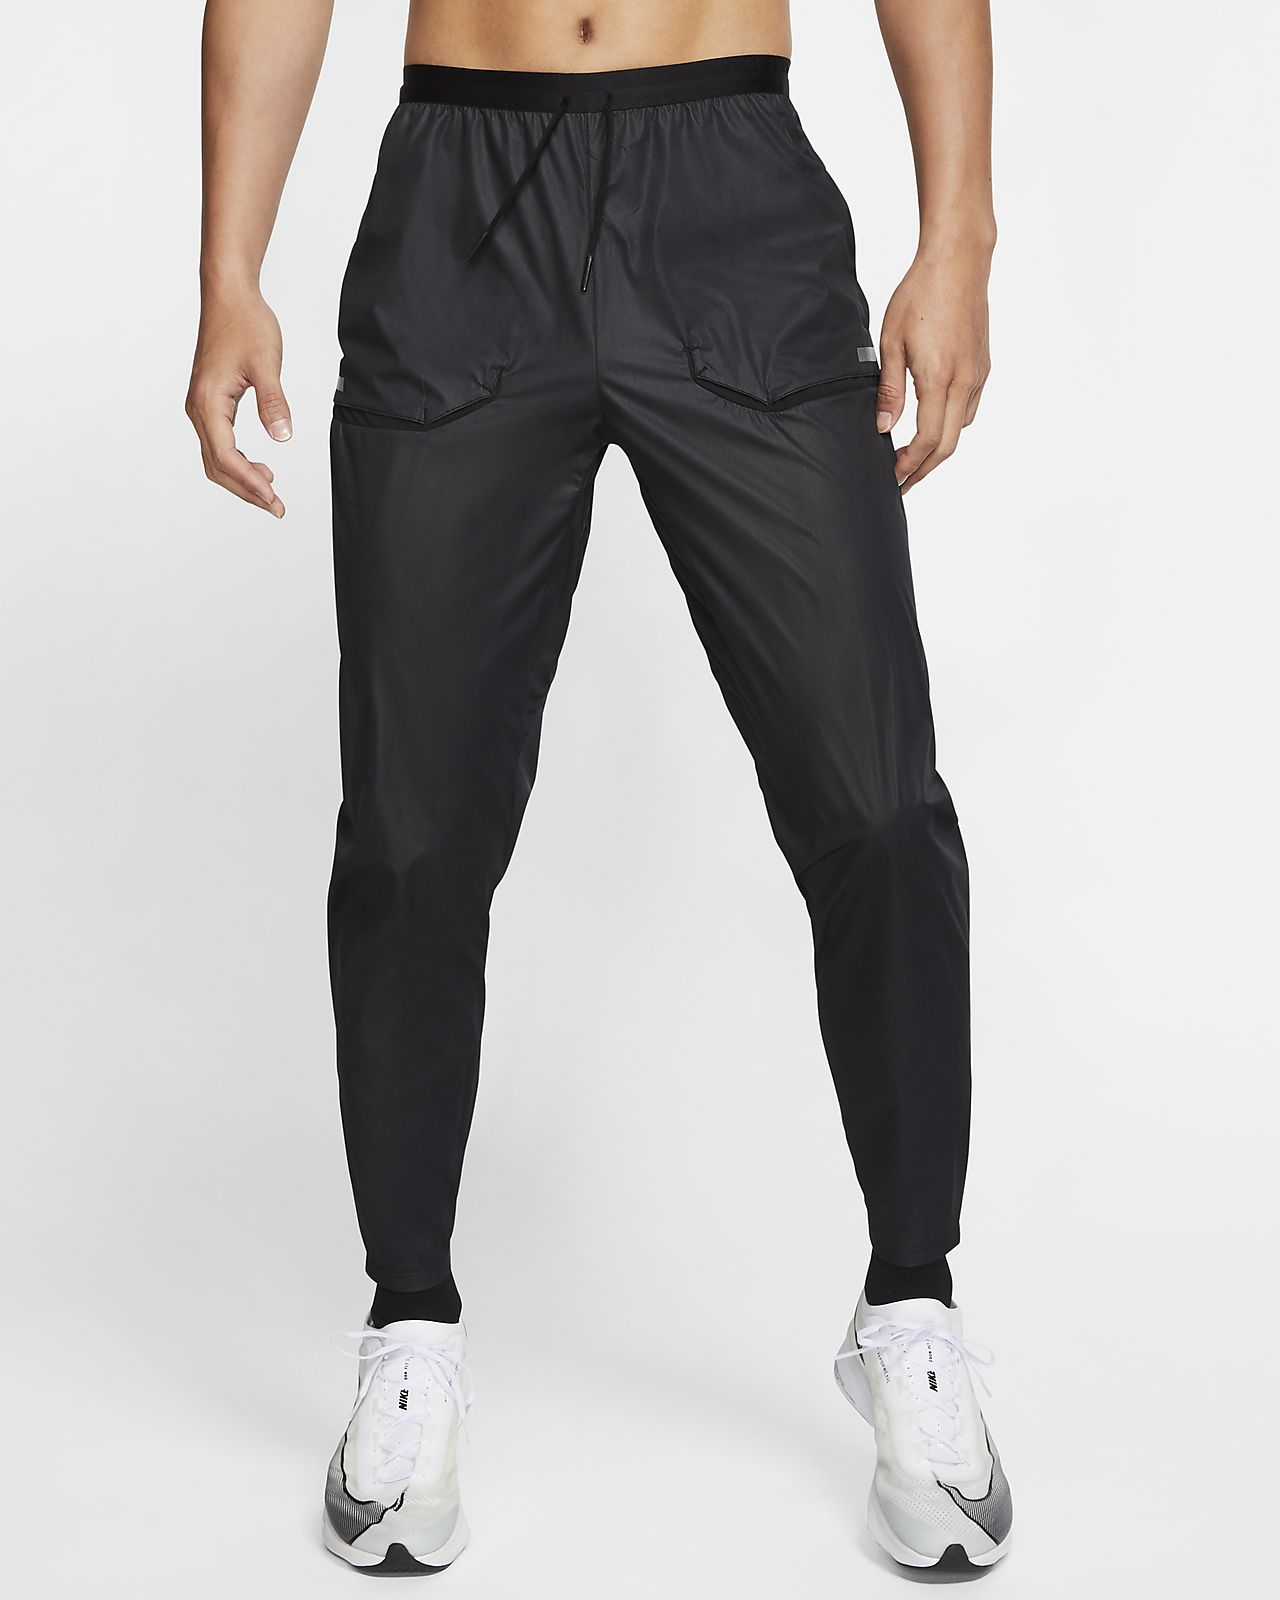 pantaloni corsa uomo nike